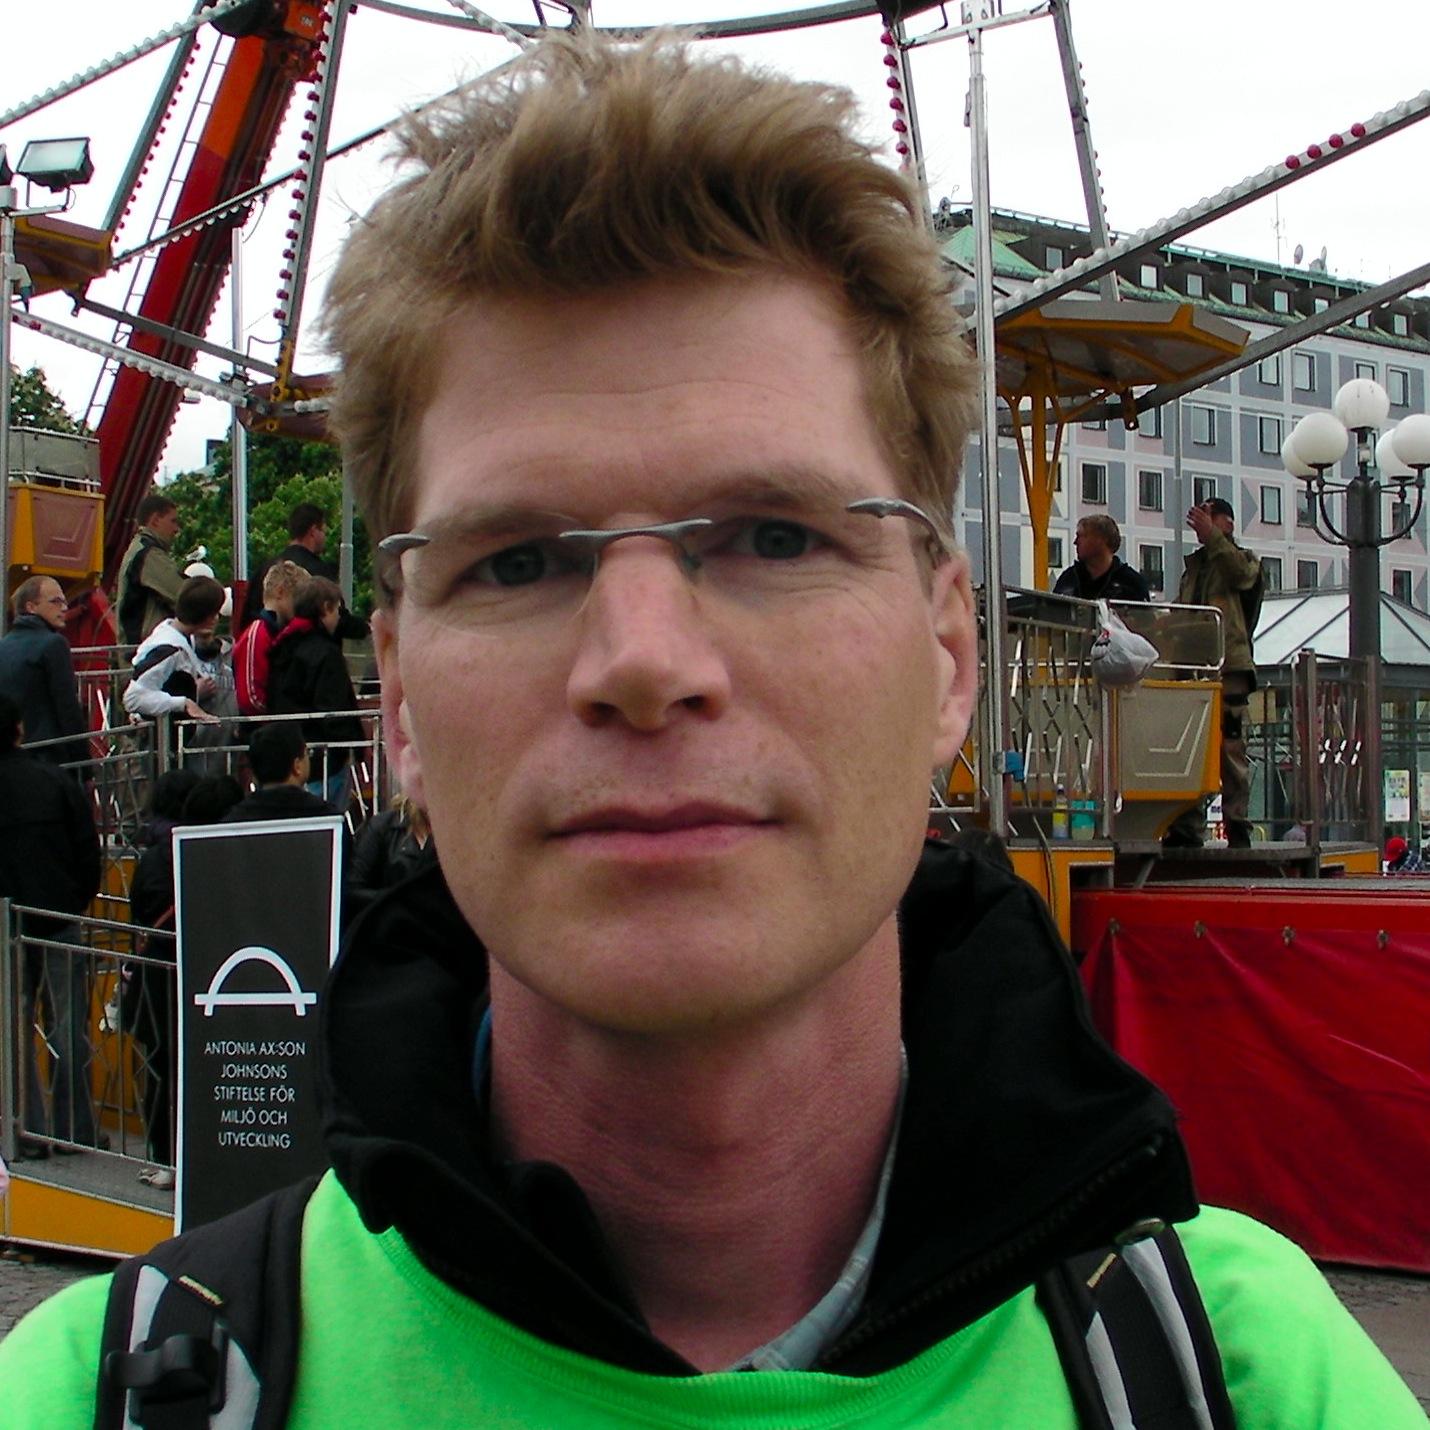 Jens Ekohjul